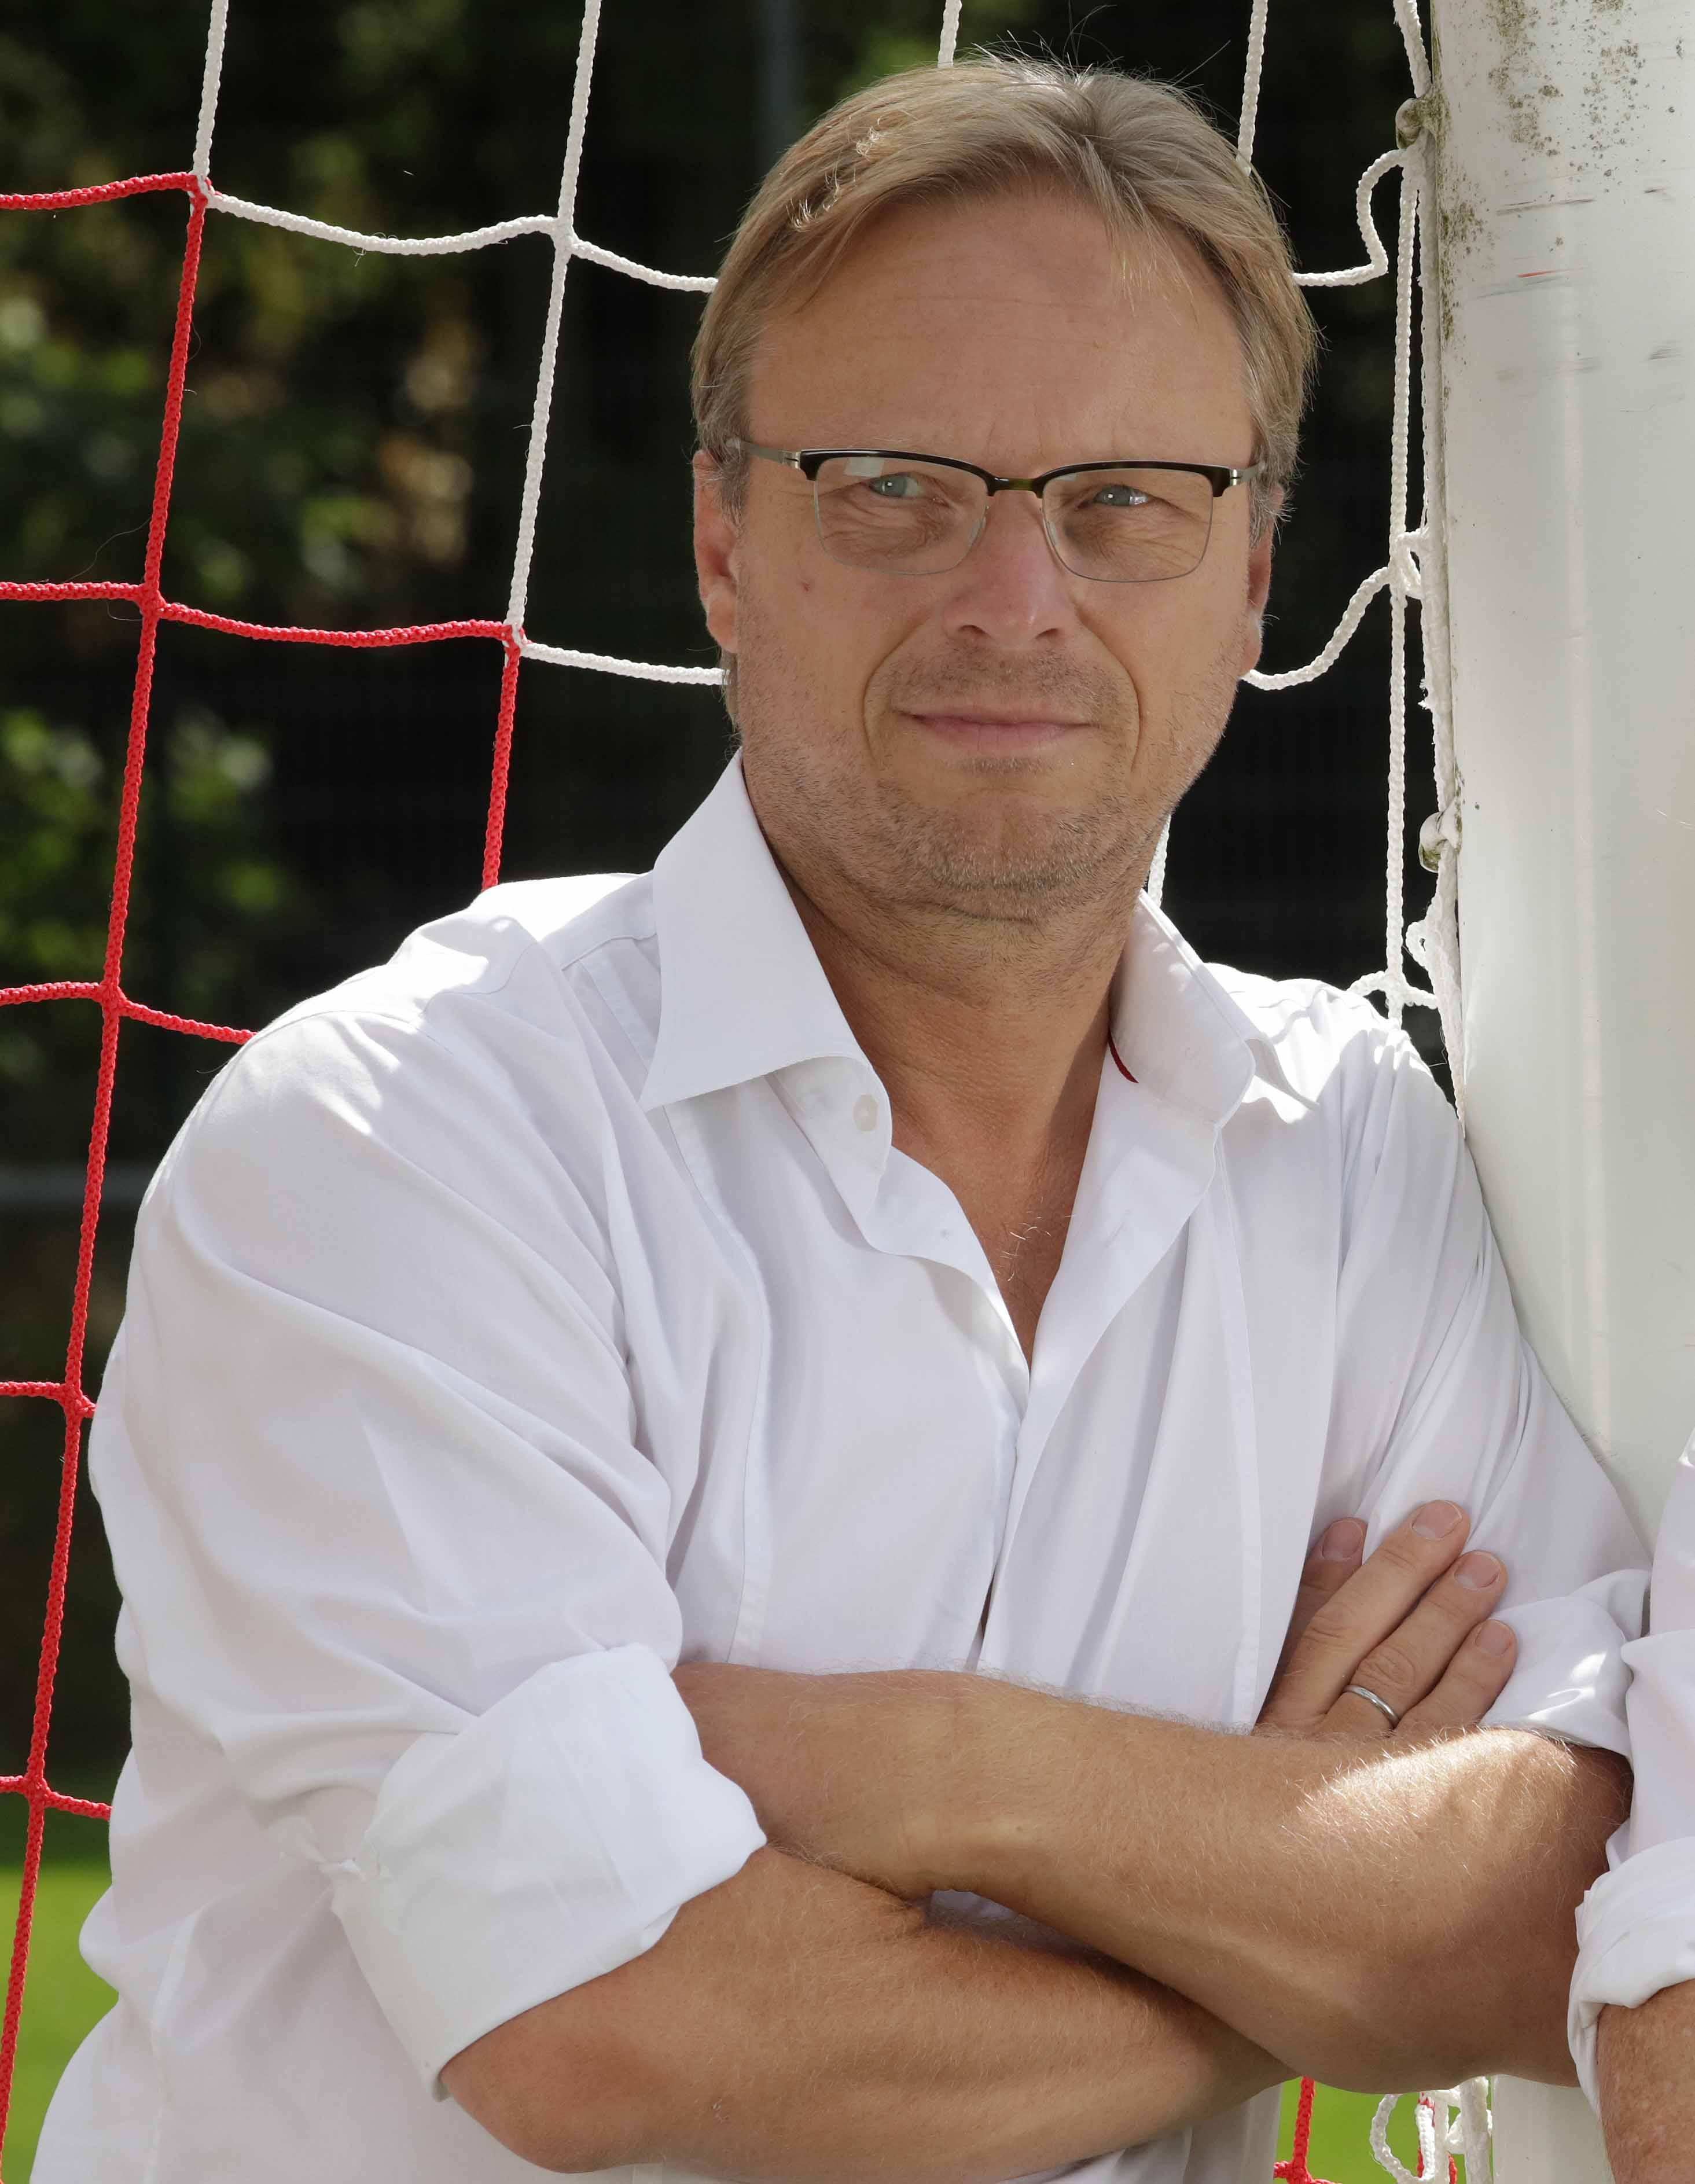 Jürgen Fromme